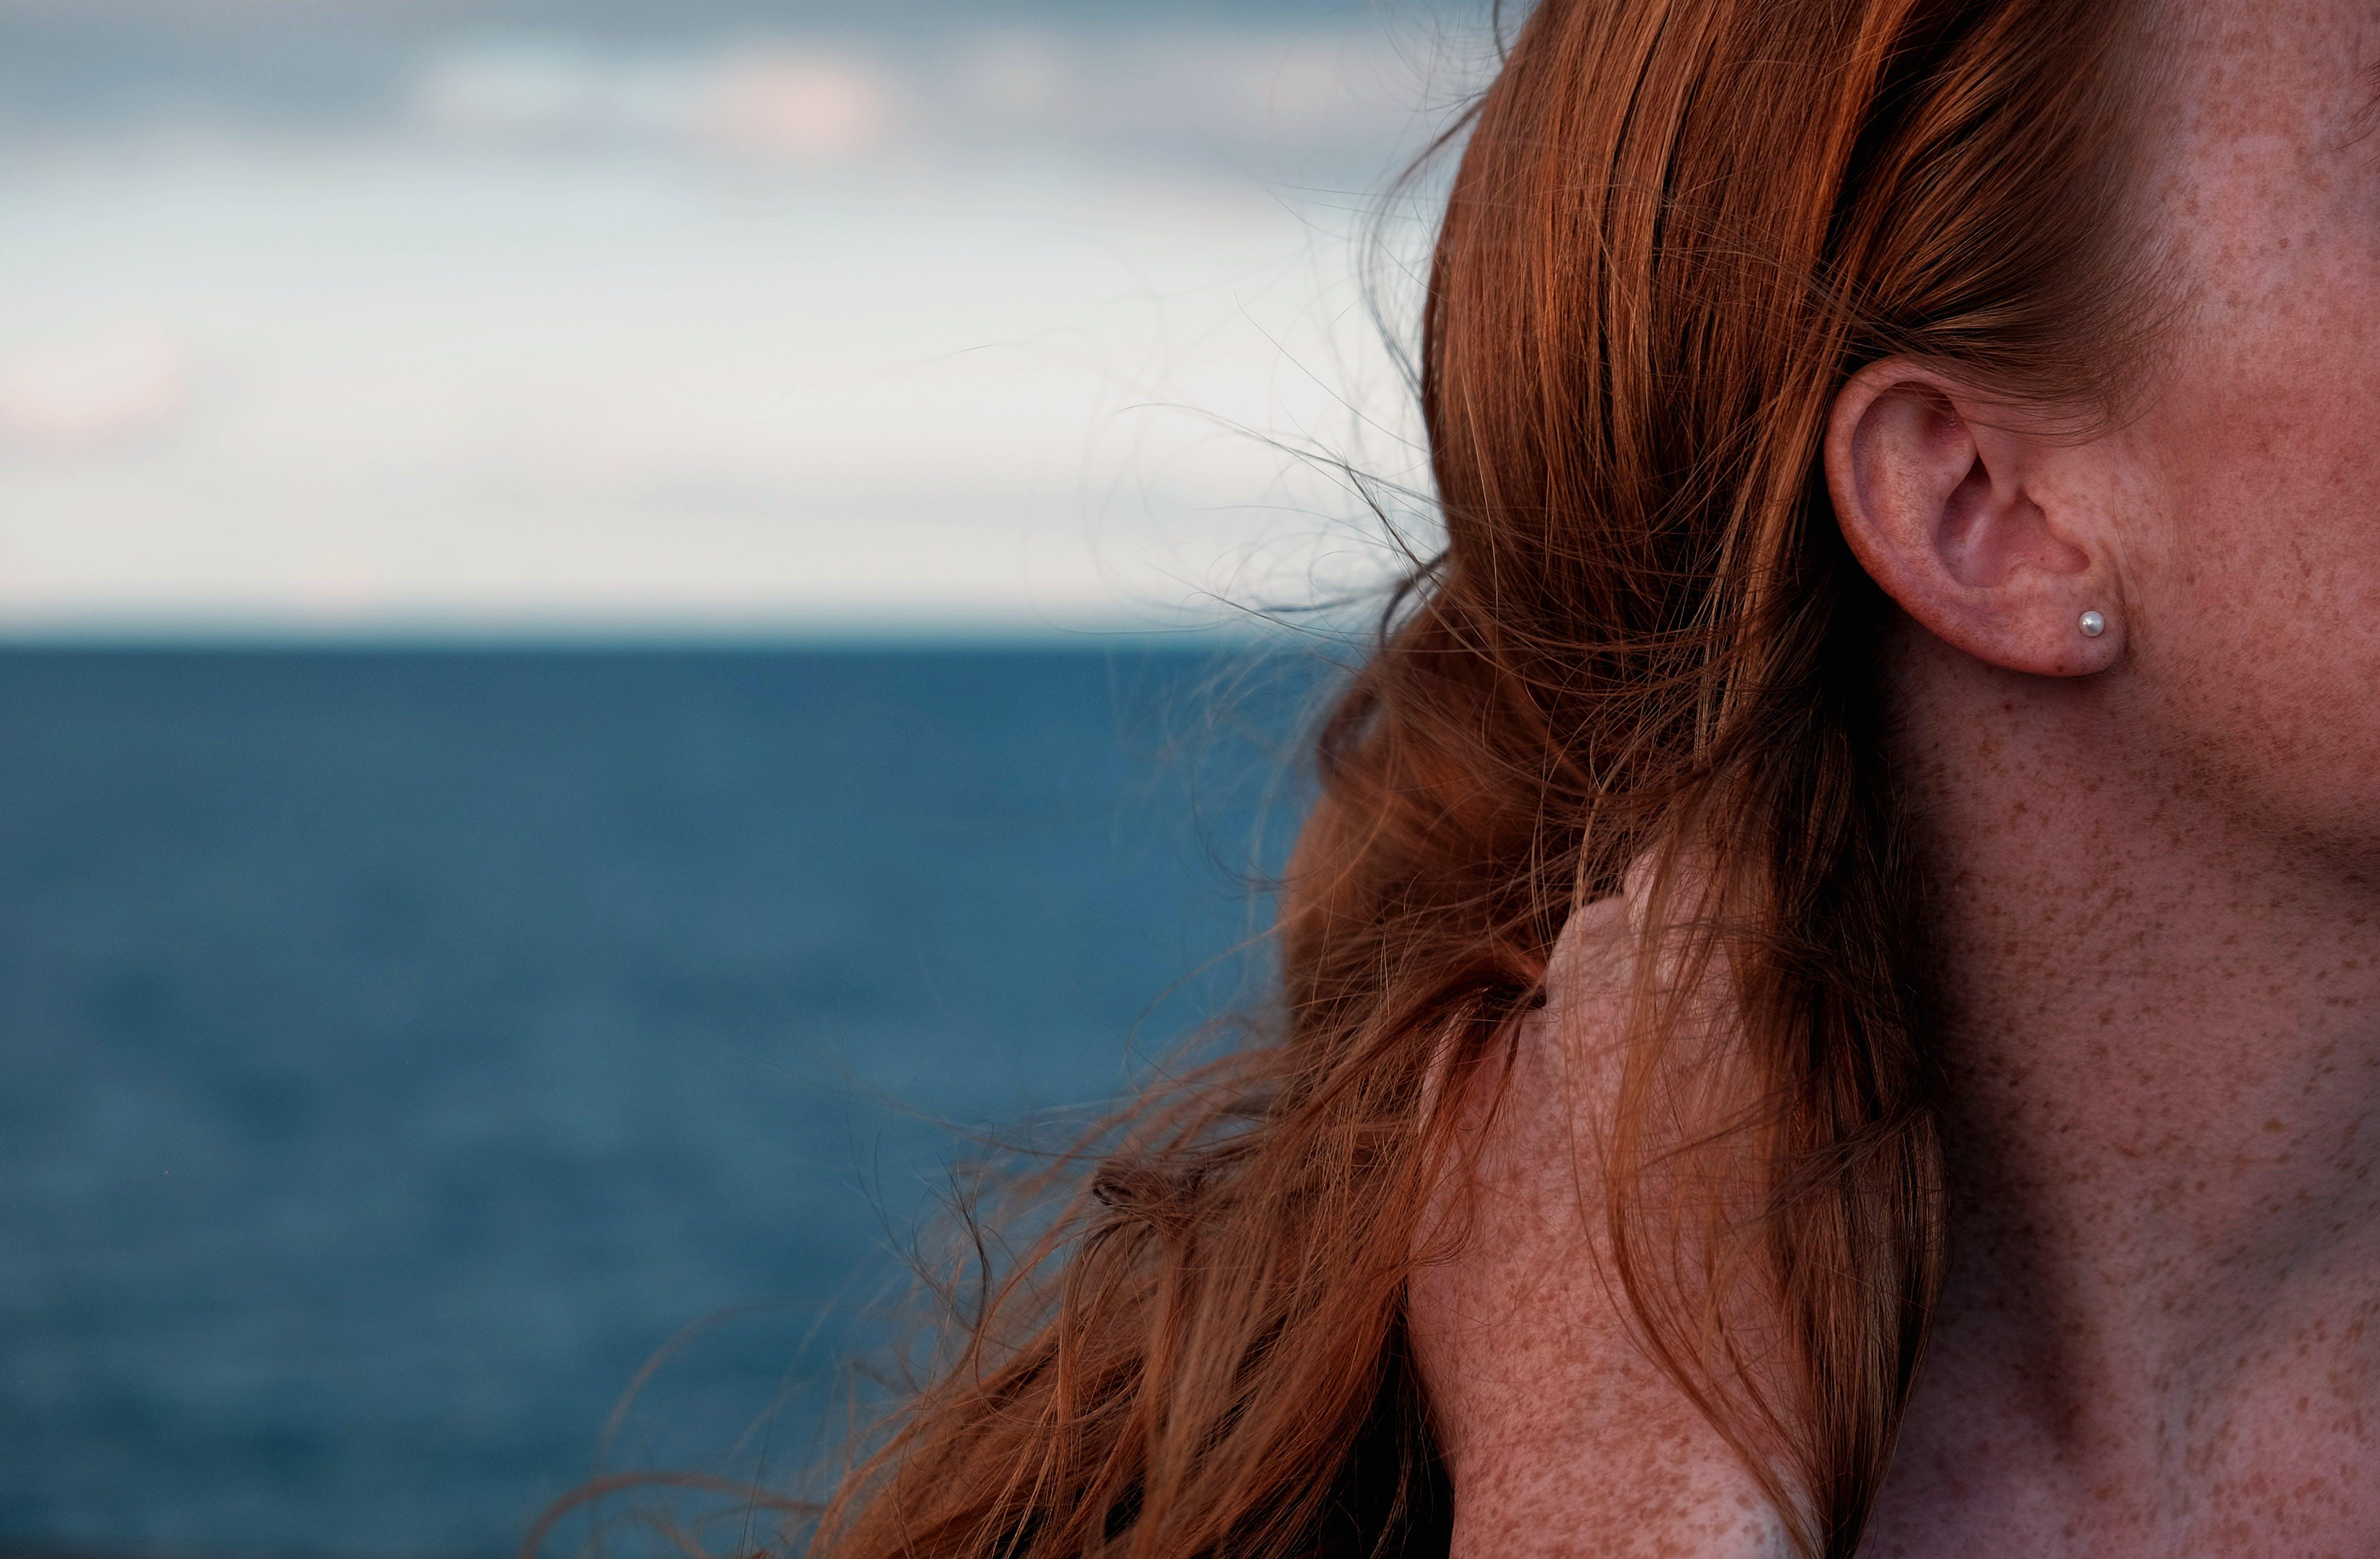 Free stock photo of sky, ocean, hair, redhead